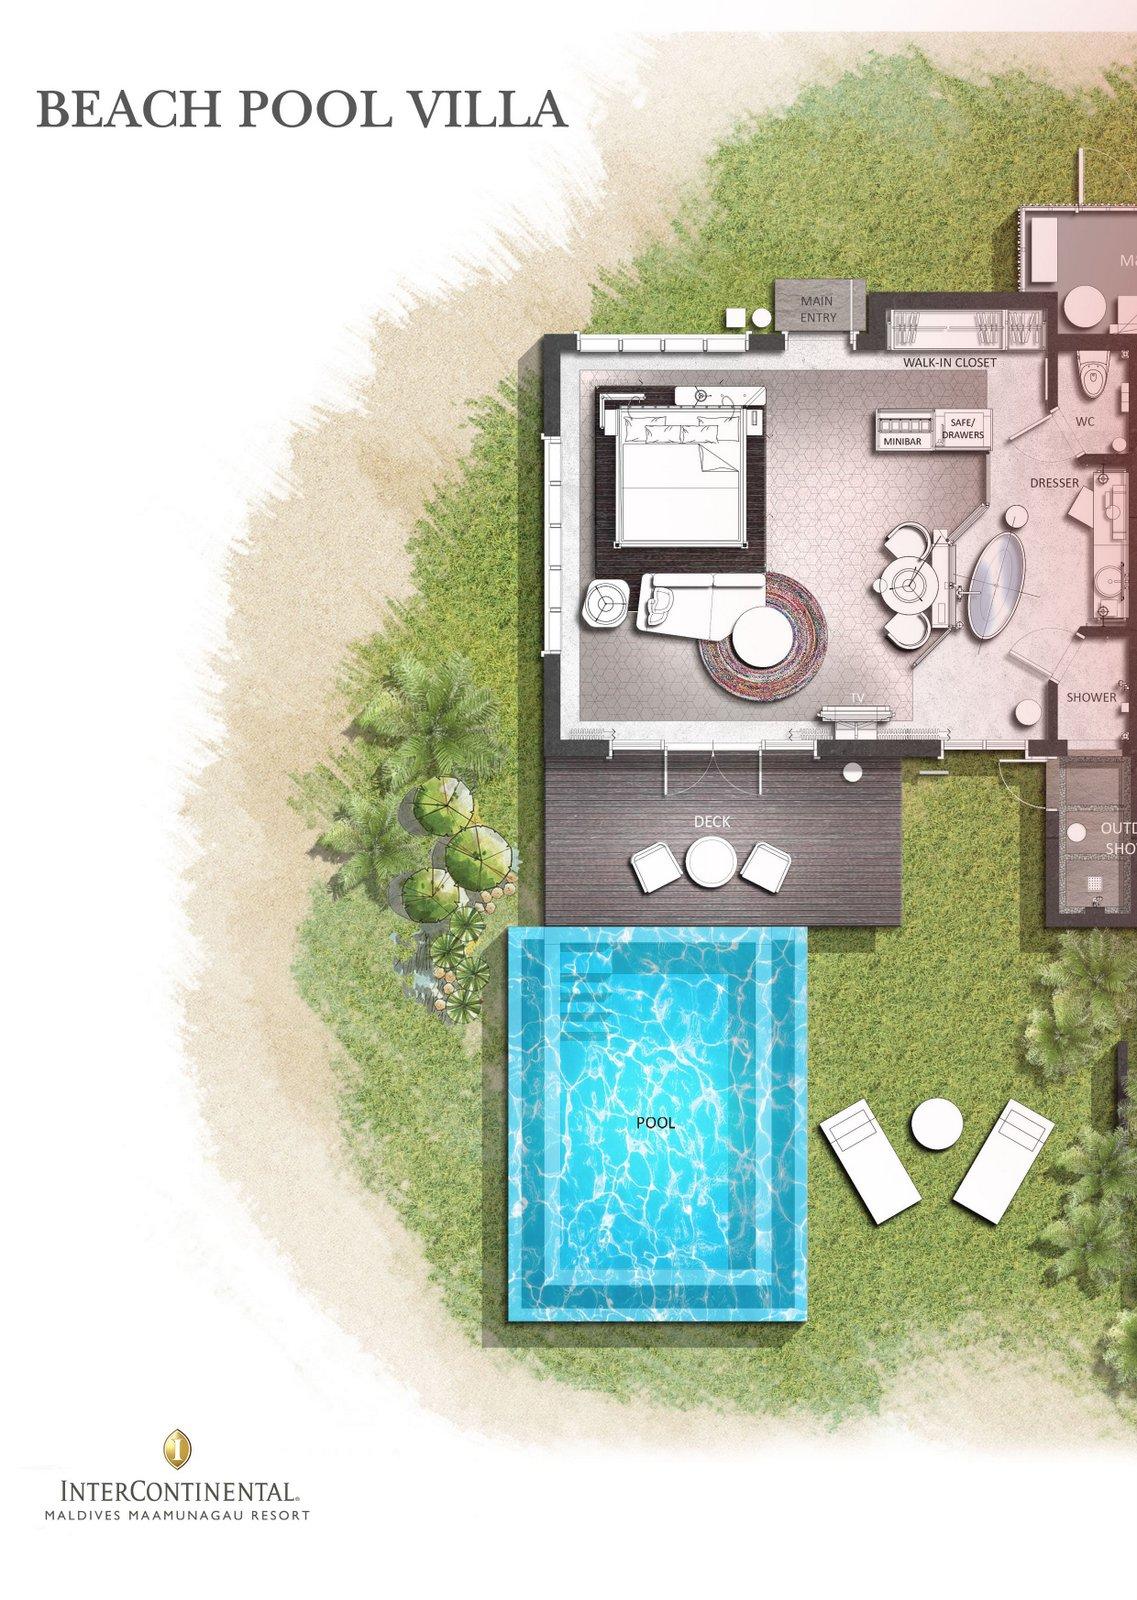 Мальдивы, отель Intercontinental Maldives Maamunagau, план-схема номера Beach Pool Villa